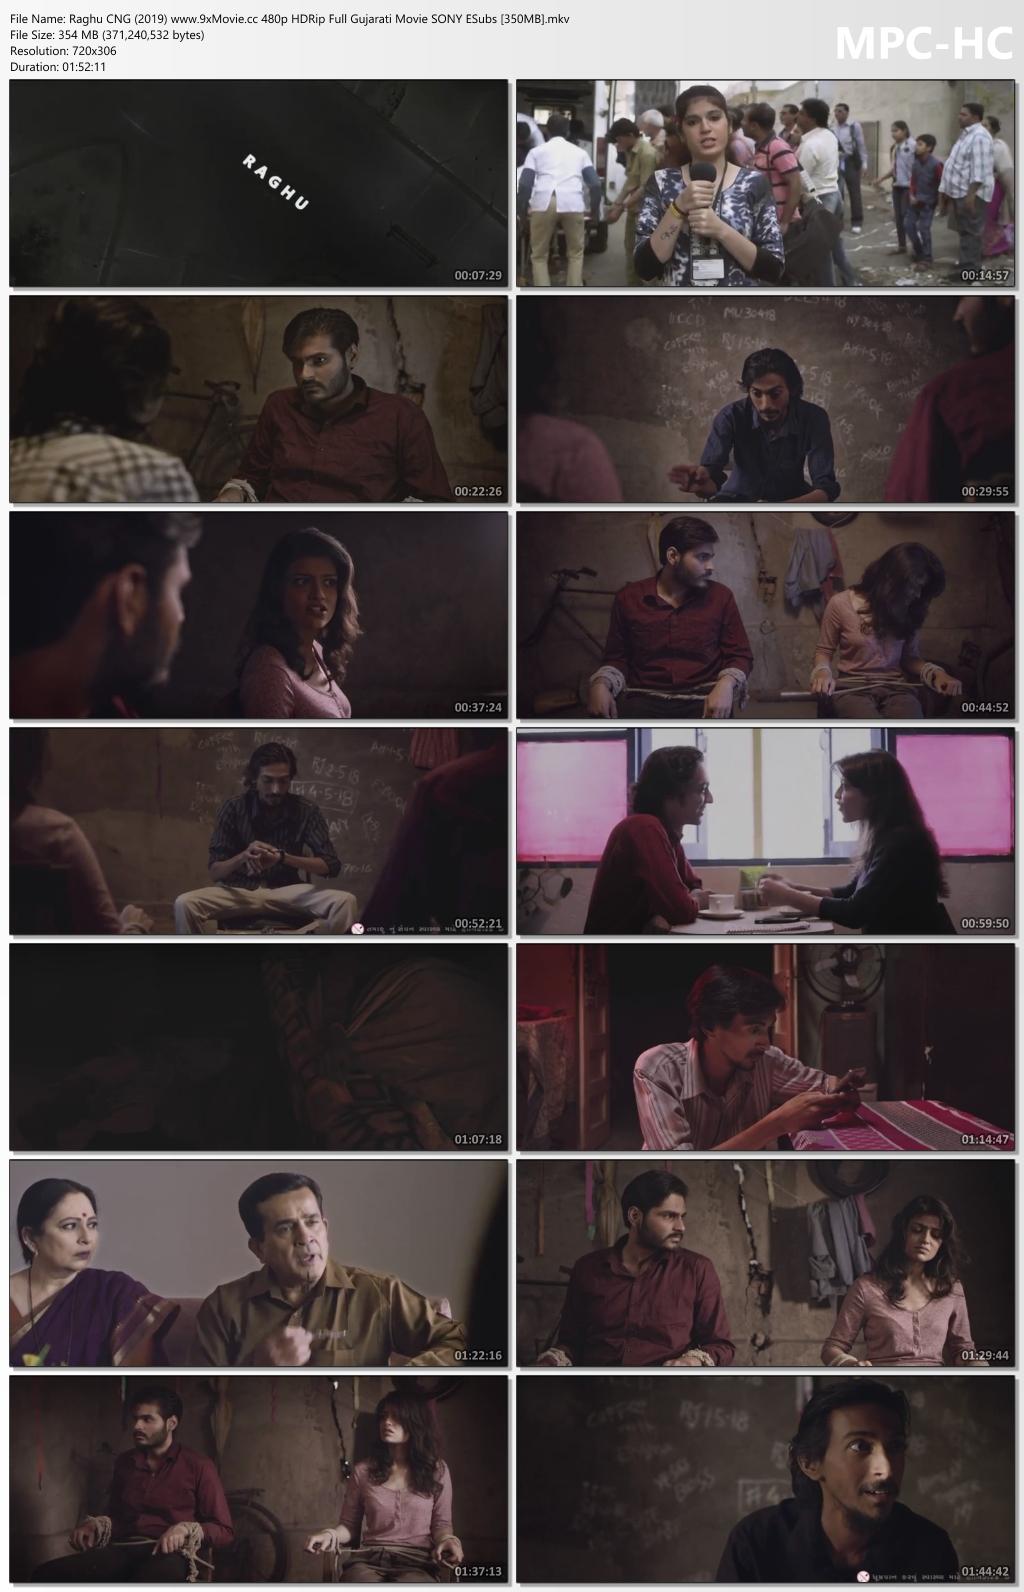 Raghu-CNG-2019-www-9x-Movie-cc-480p-HDRip-Full-Gujarati-Movie-SONY-ESubs-350-MB-mkv